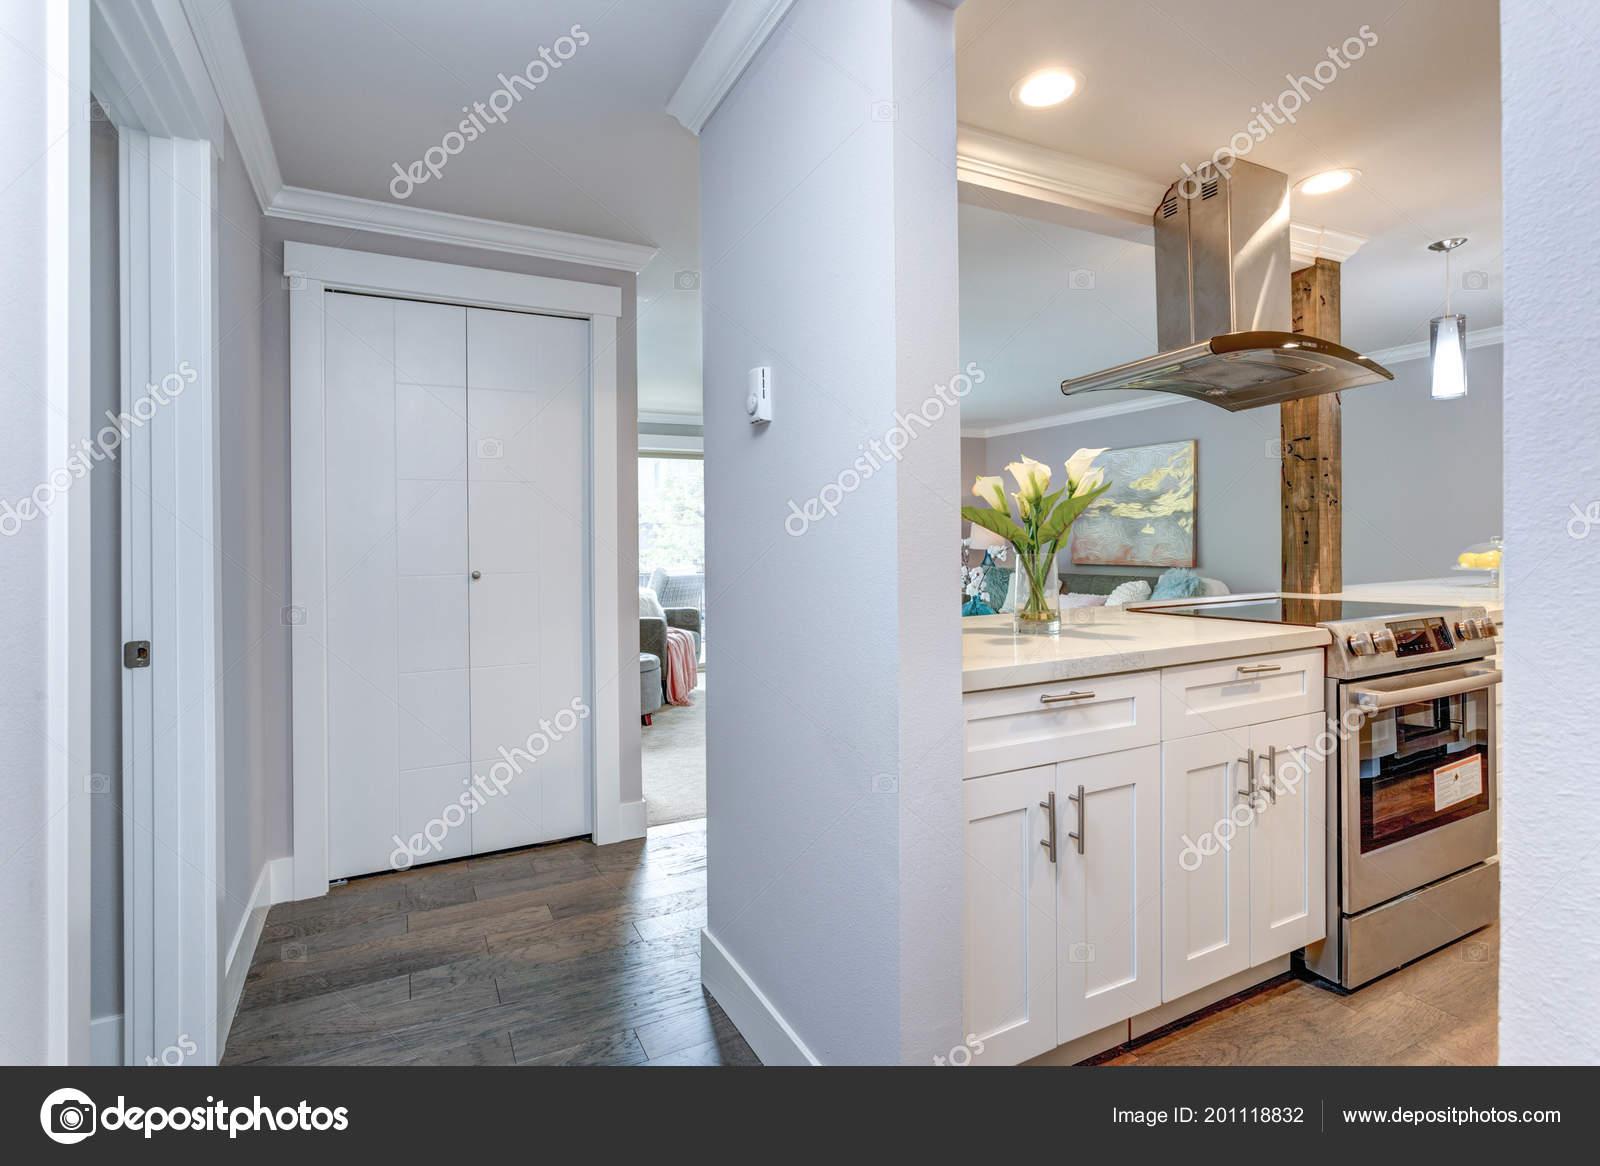 White Small Kitchen Stainless Steel Appliances Modern ...